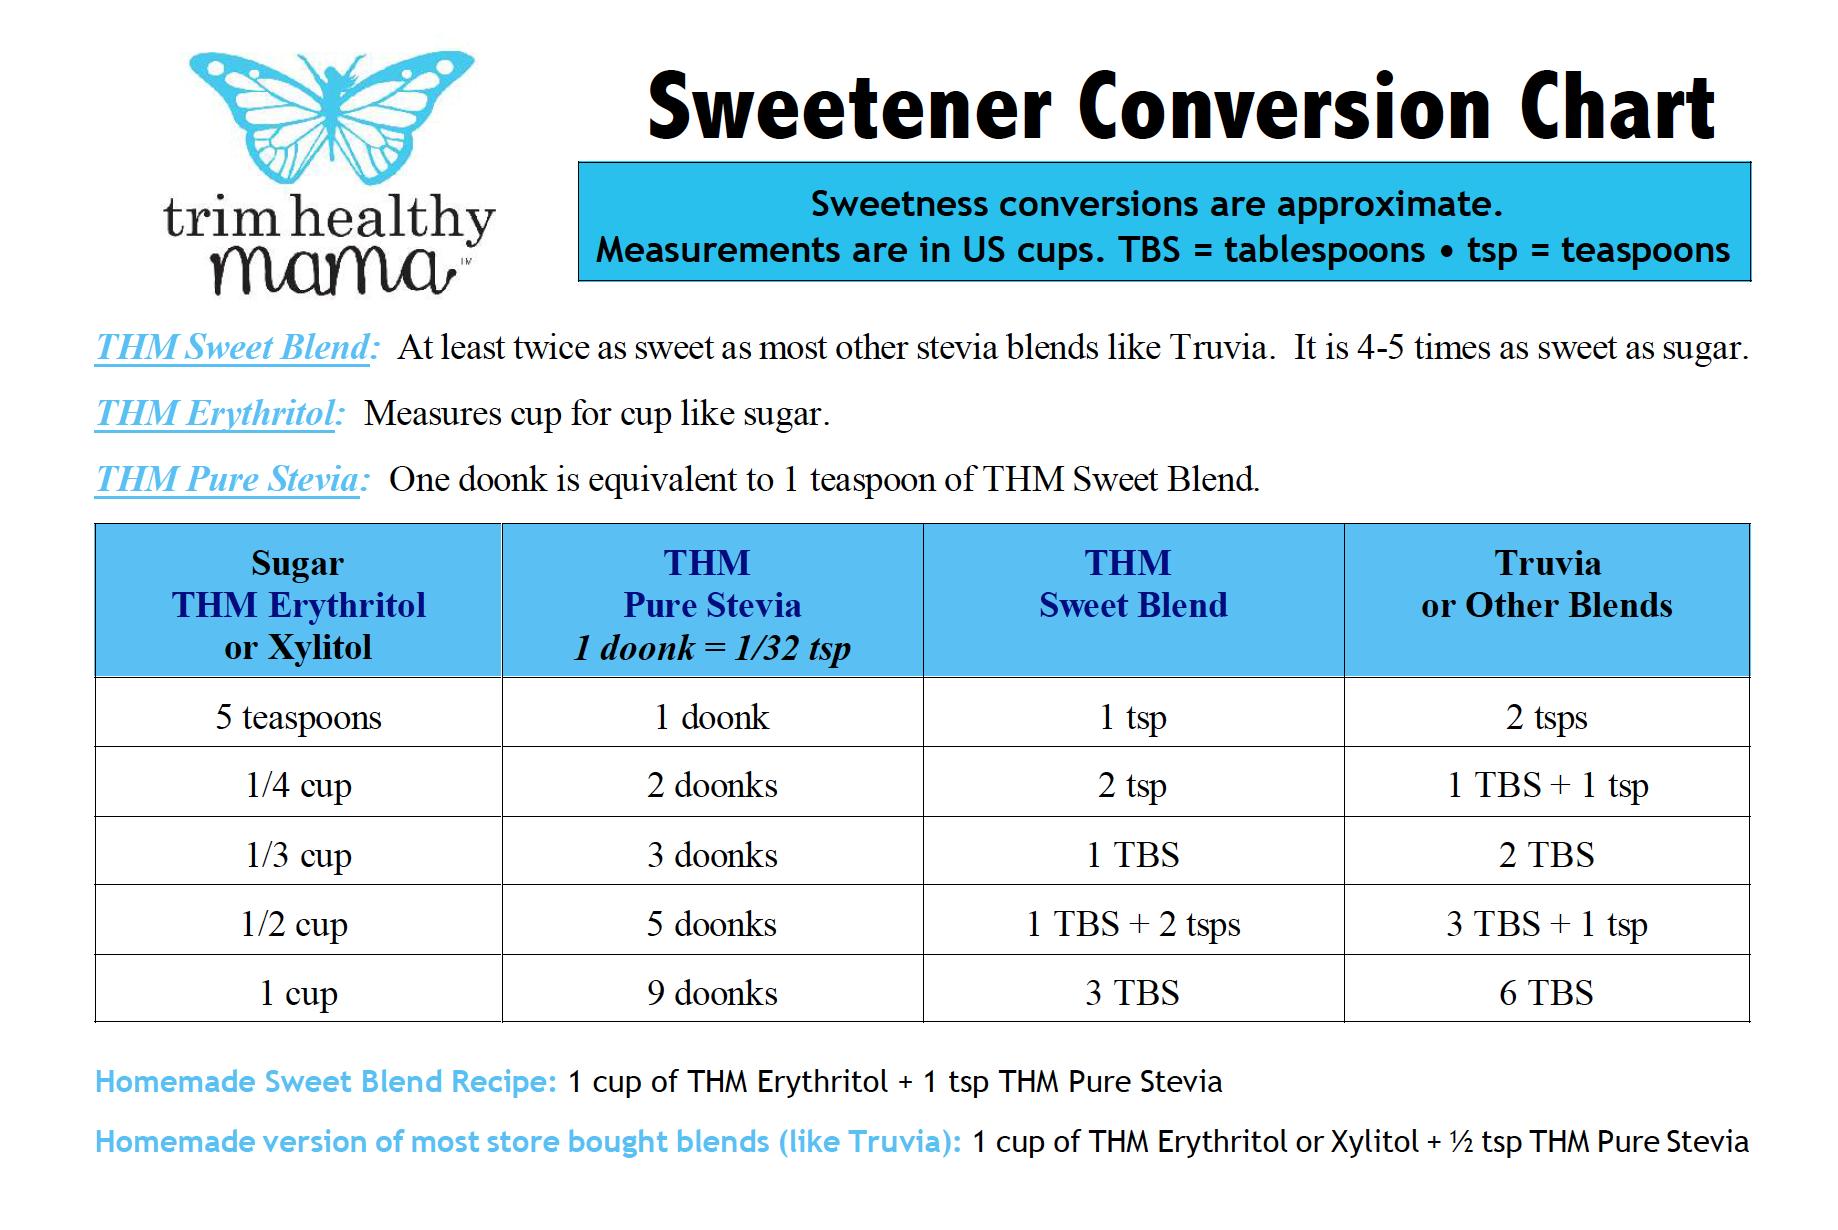 Sweetener conversion chart thm recipes pinterest recipes sweetener conversion chart nvjuhfo Images